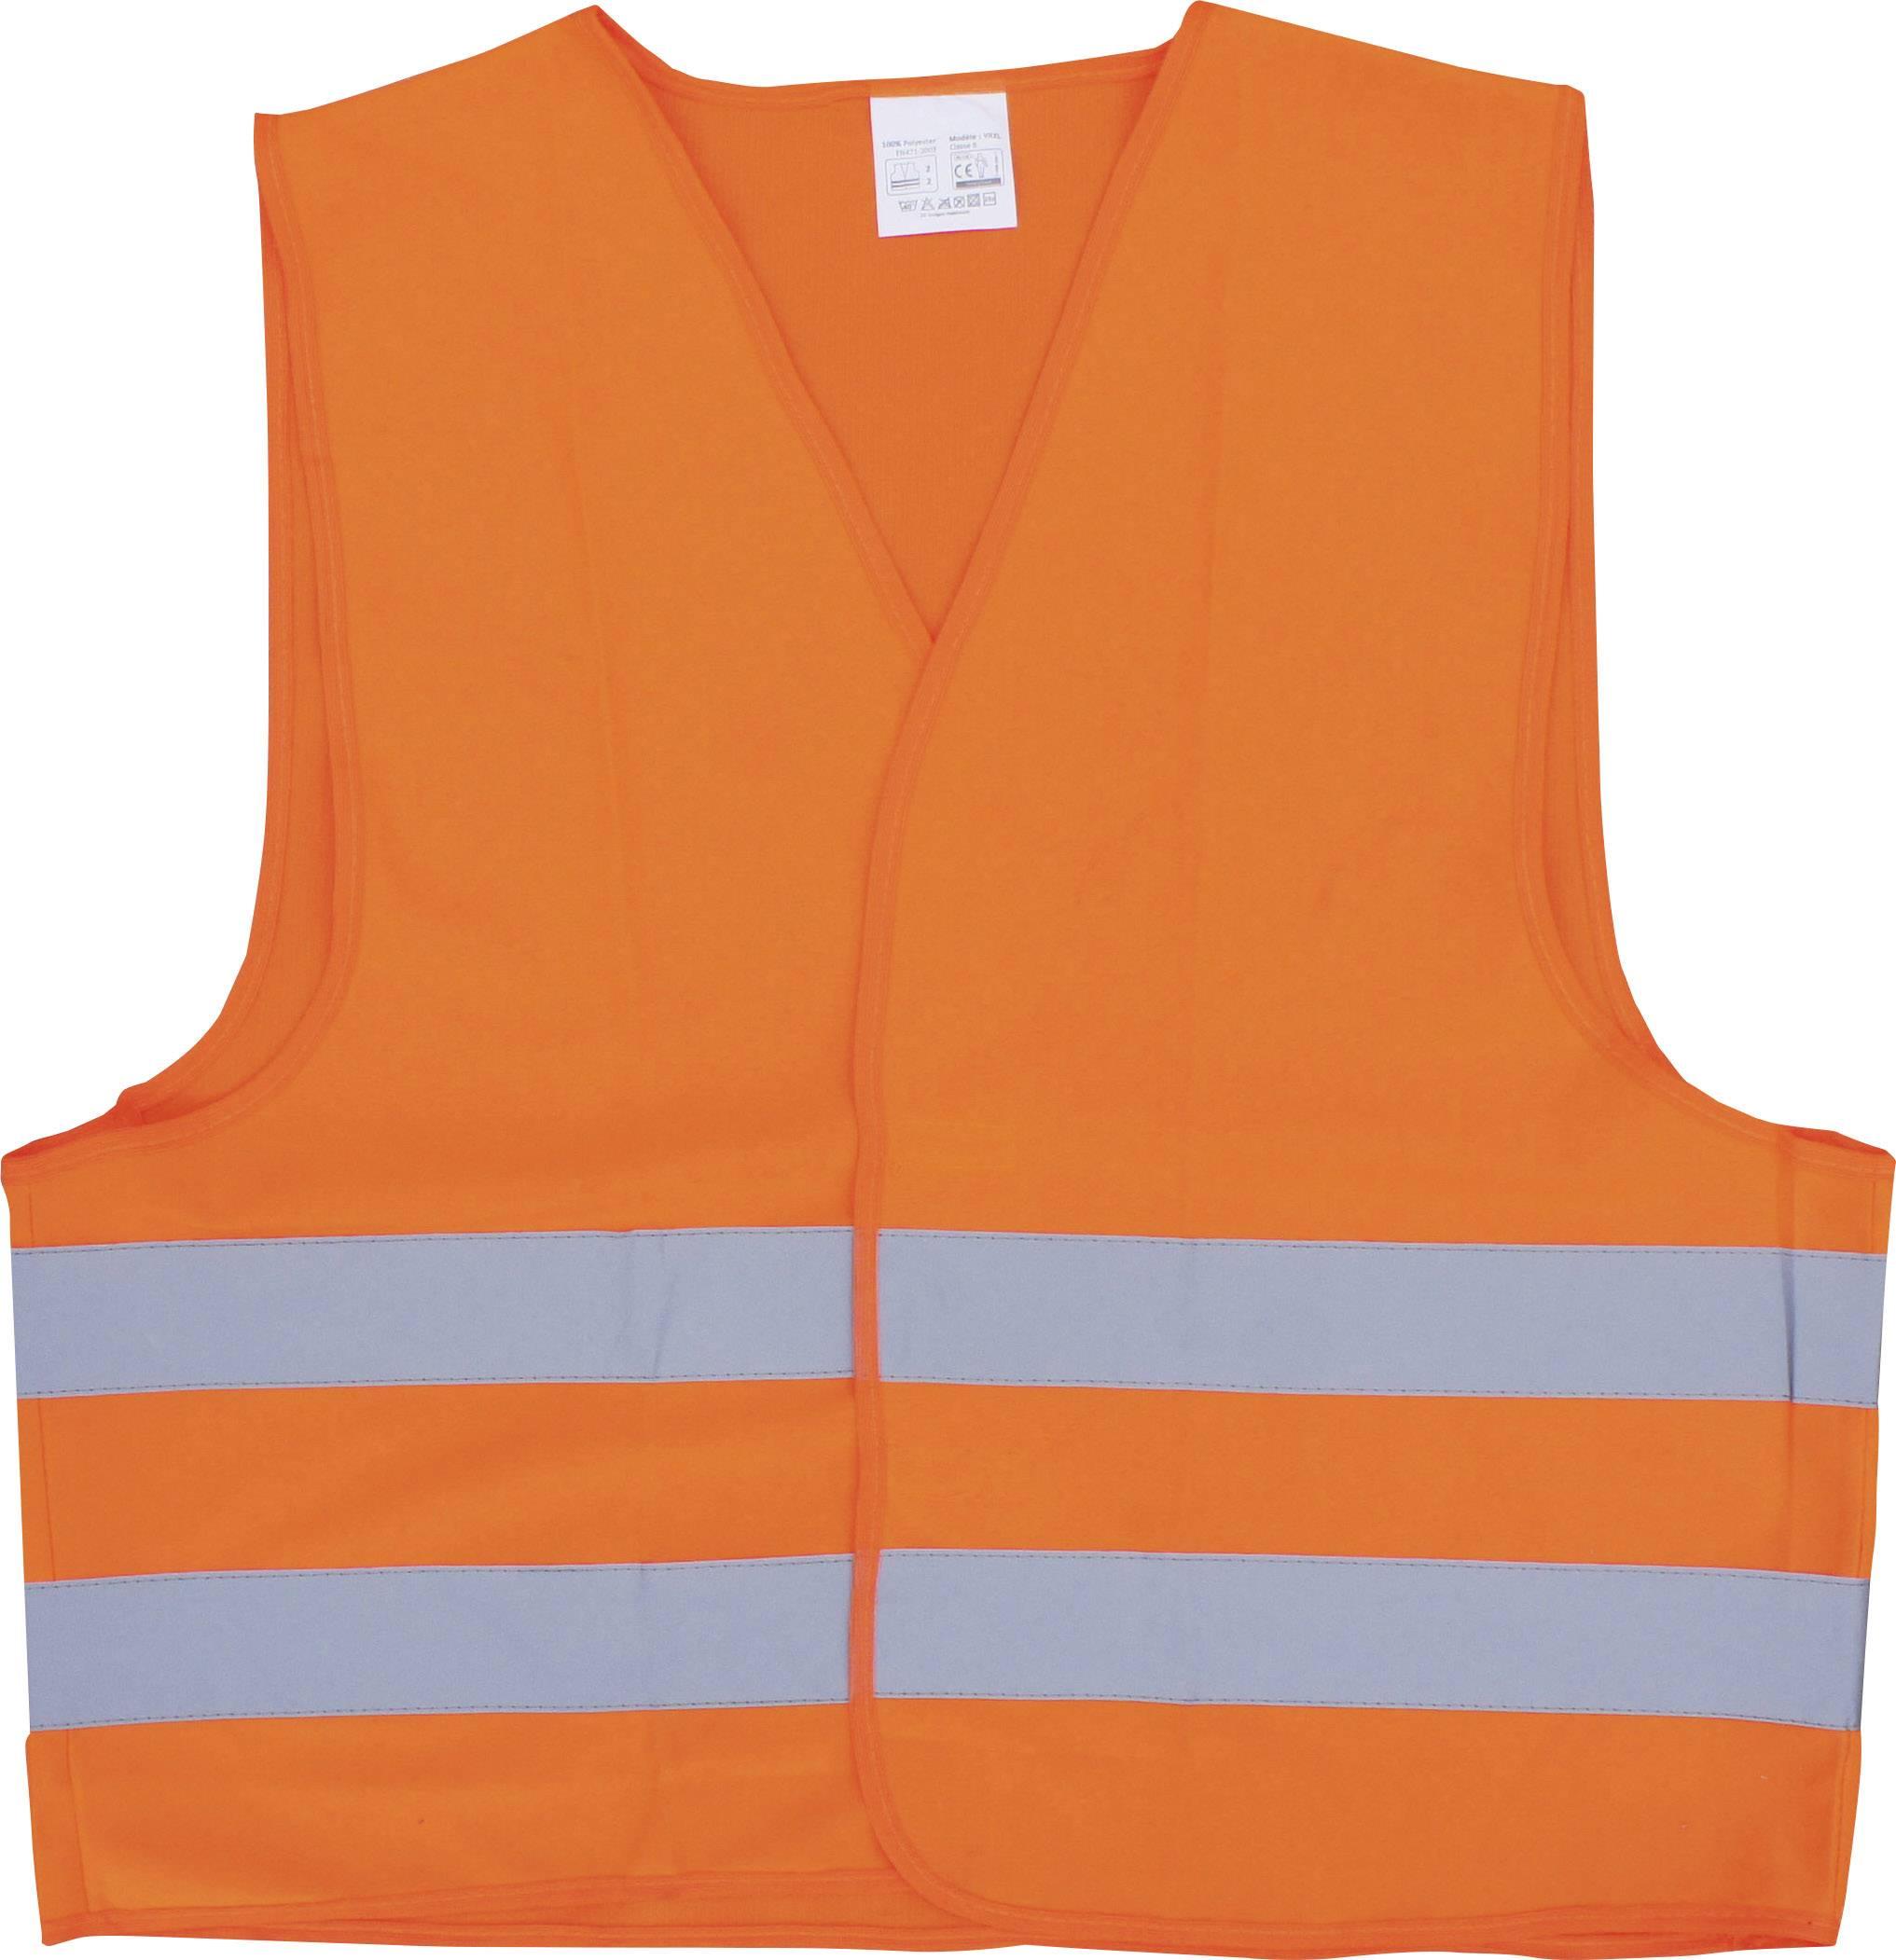 l'ultimo de008 547e9 VISO VRXL Giubbotto catarifrangente arancione EN 471